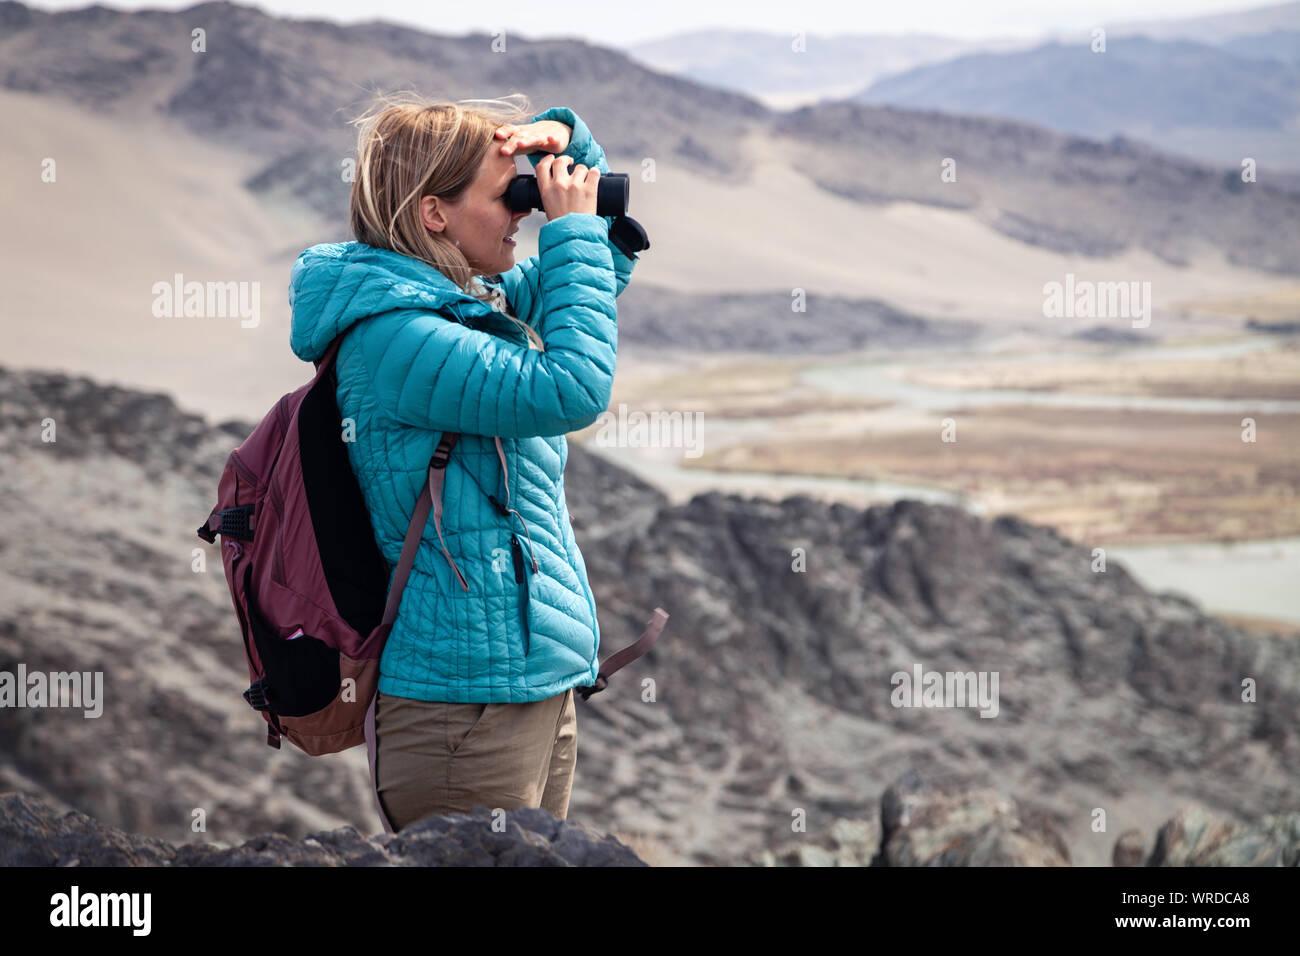 Mongolia Ulgii 2019-05-04 European beautiful girl in blue jacket looking through binocular into the distance, eagle watching, hiking, climbing, walkin Stock Photo